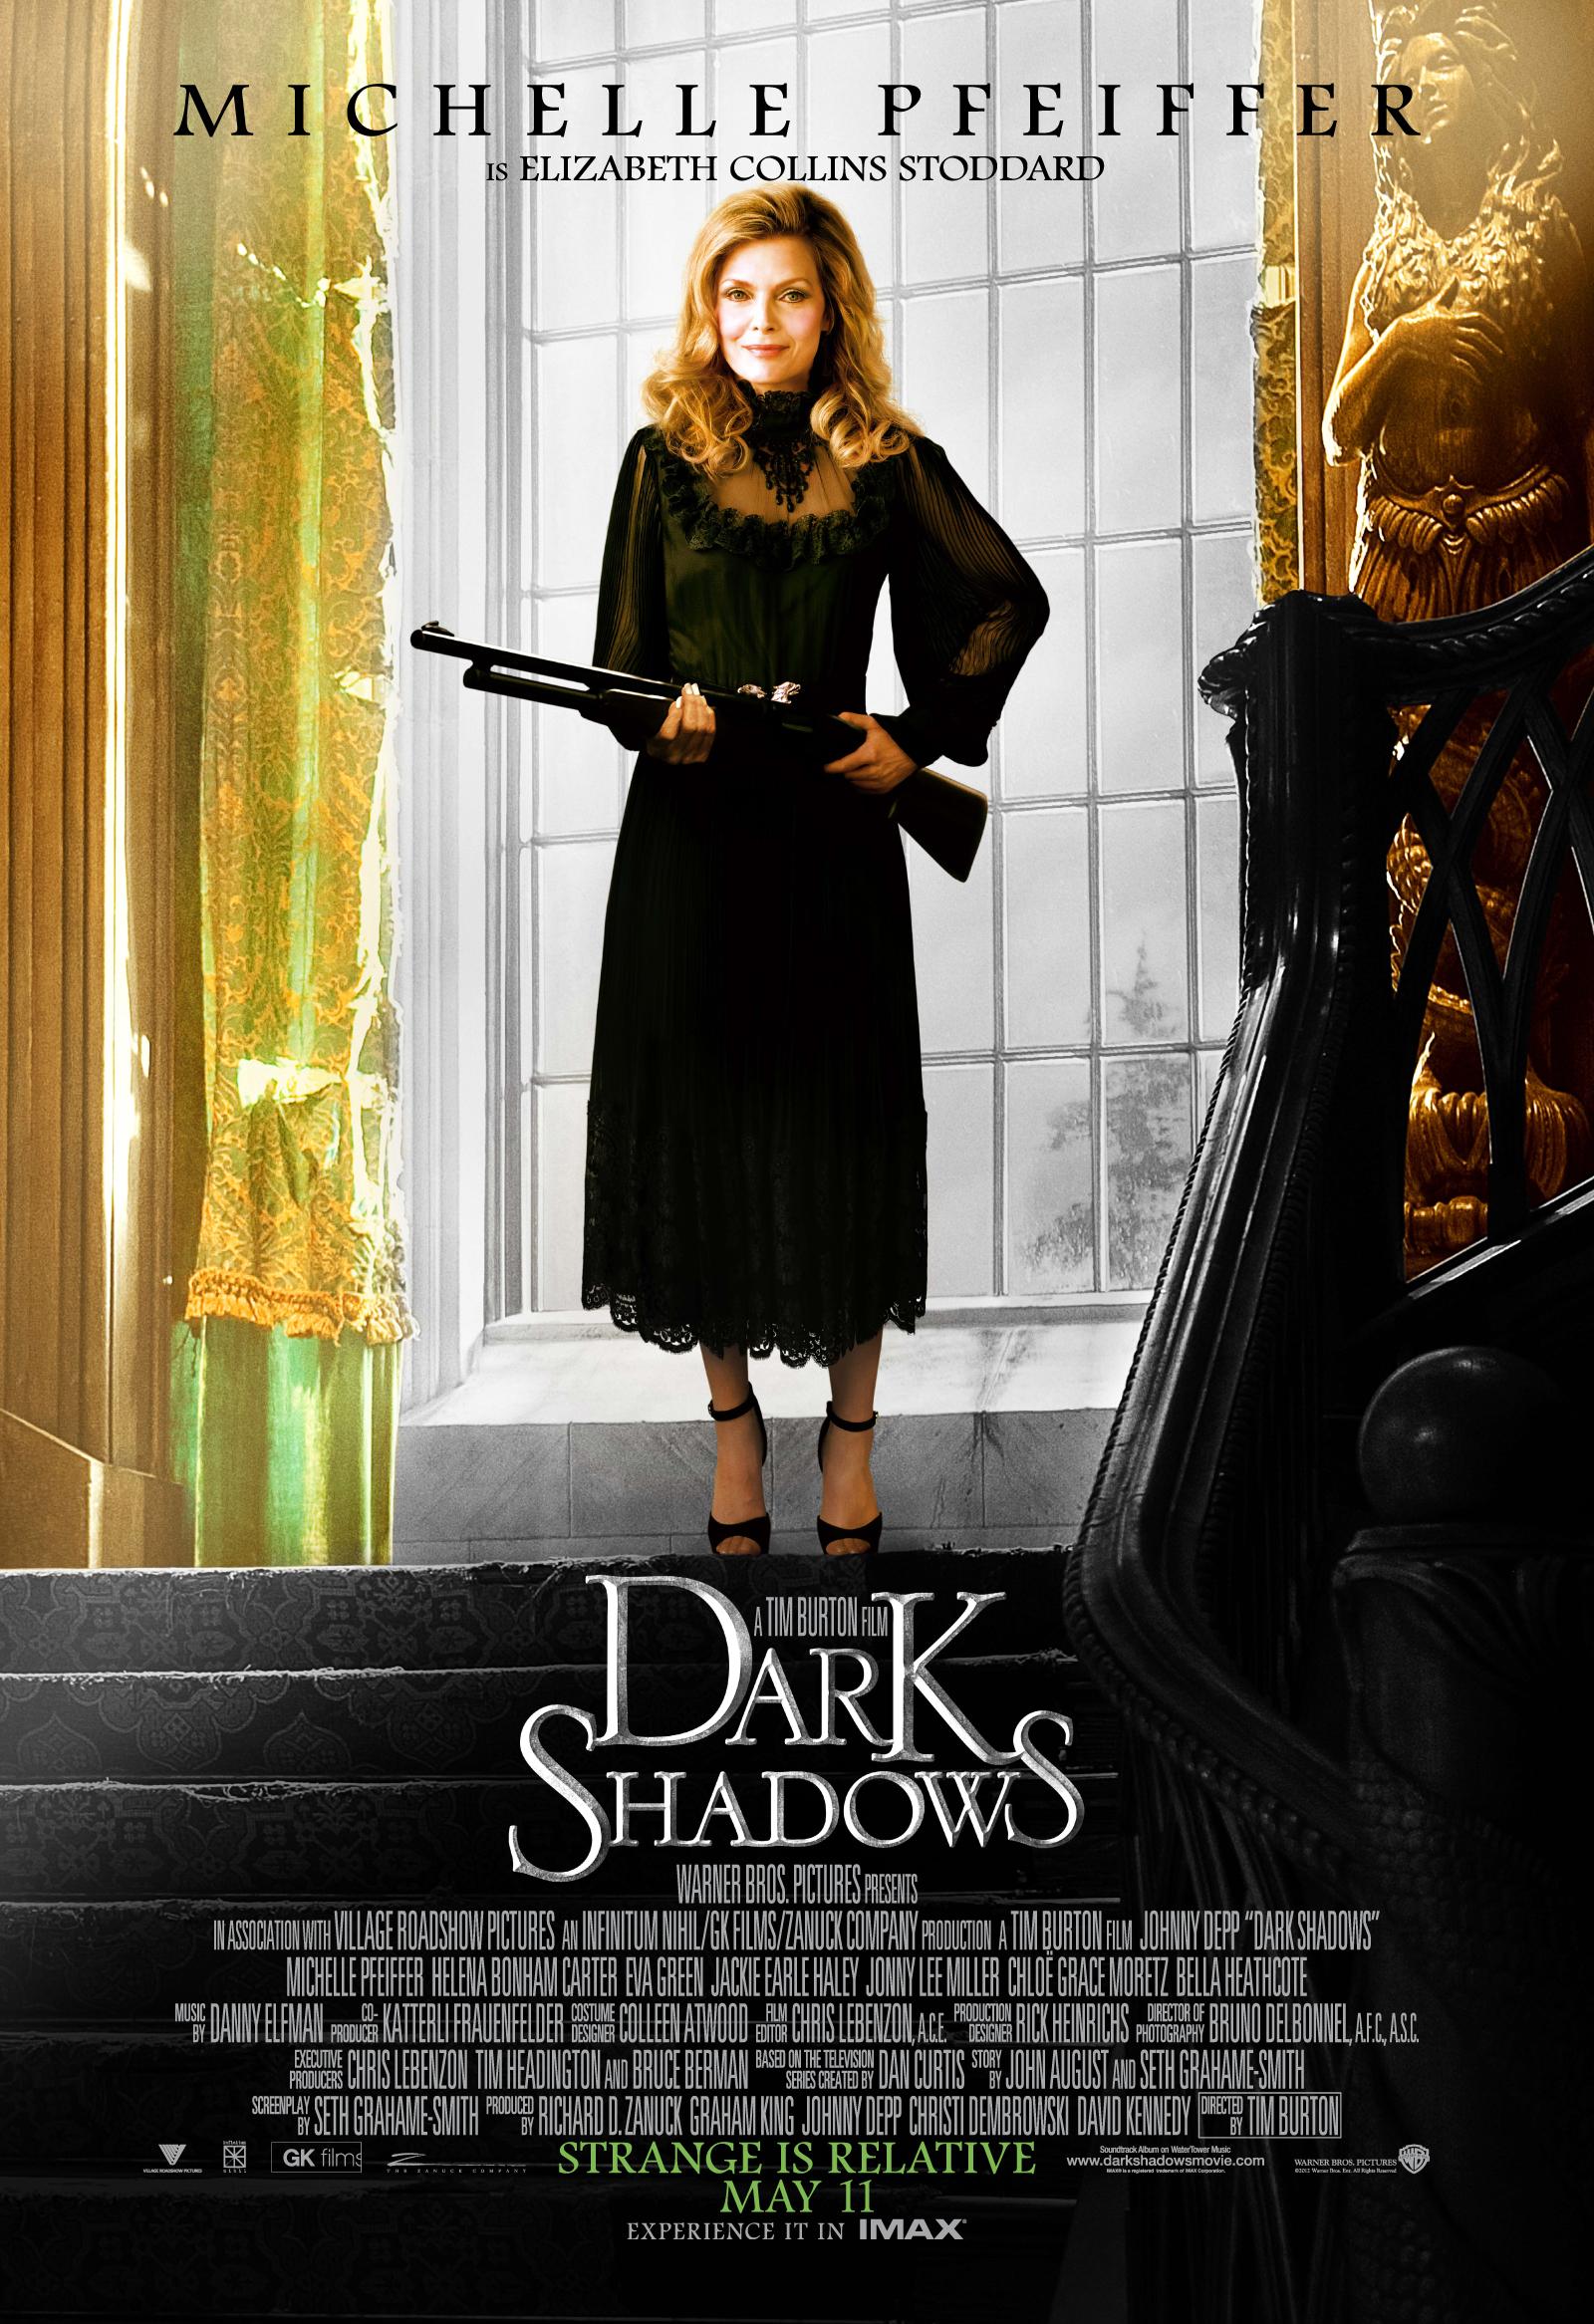 darkshadowsnewmp.jpg